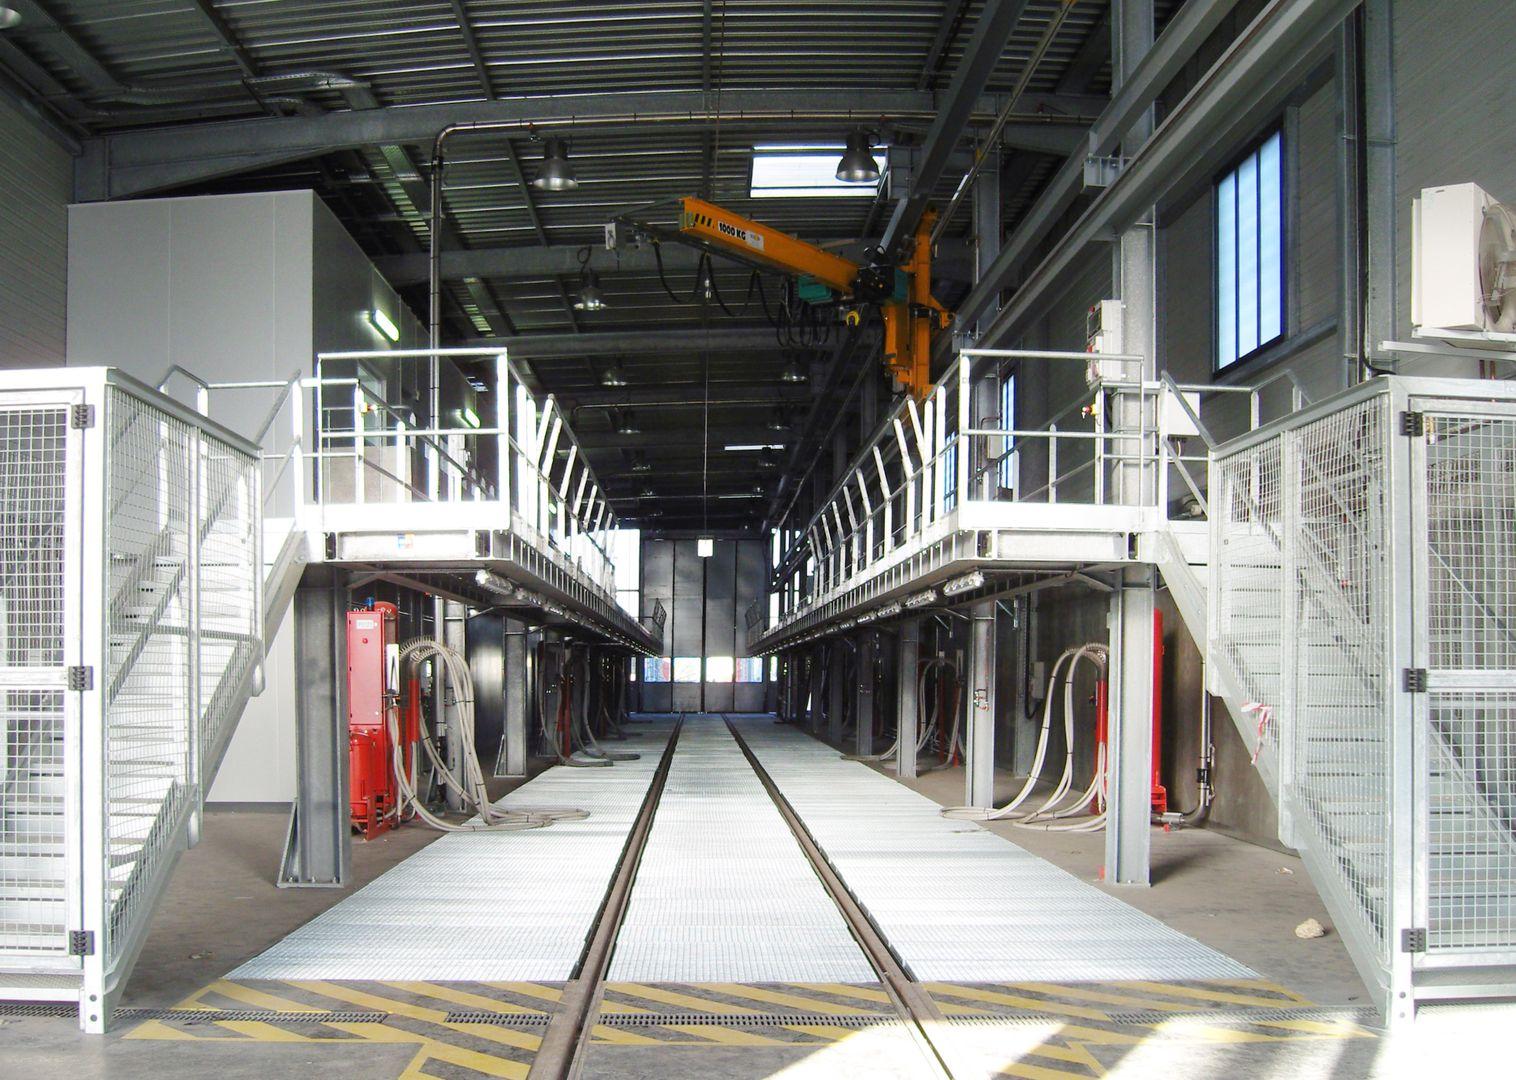 04_2007-cub-tramway-bordeaux.jpg